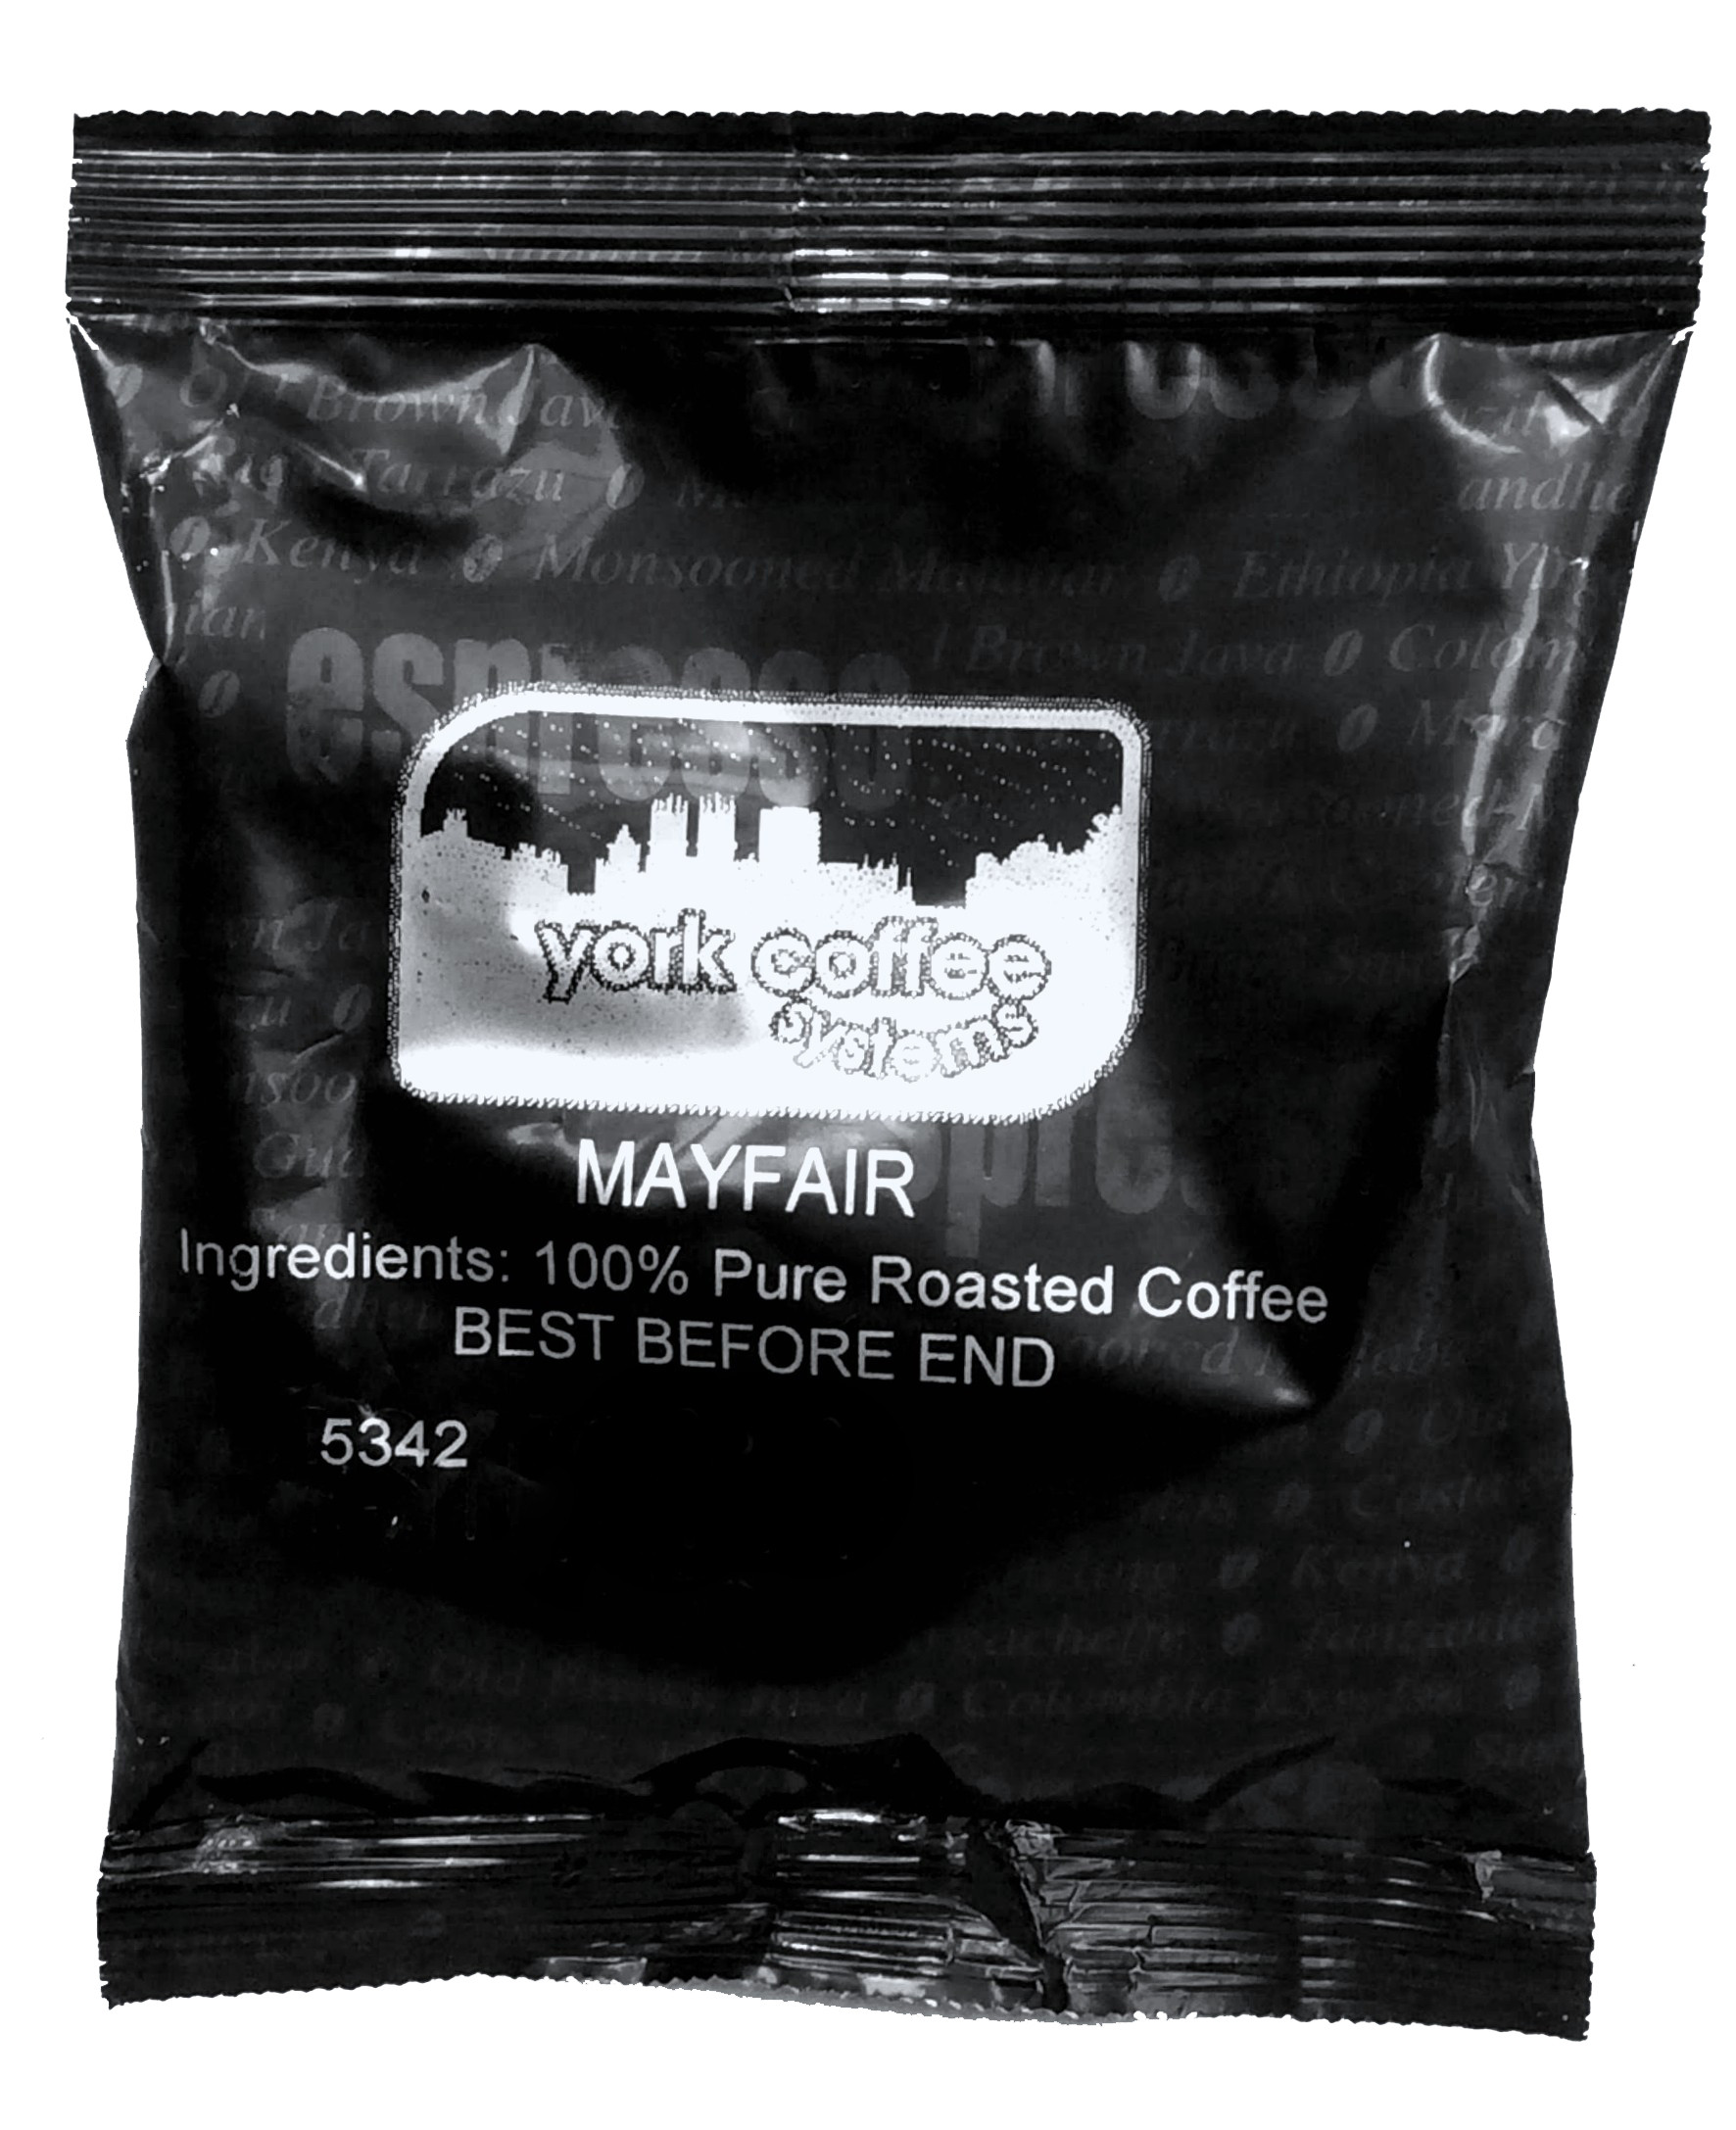 Mayfair Filter Coffee 50 x 56g